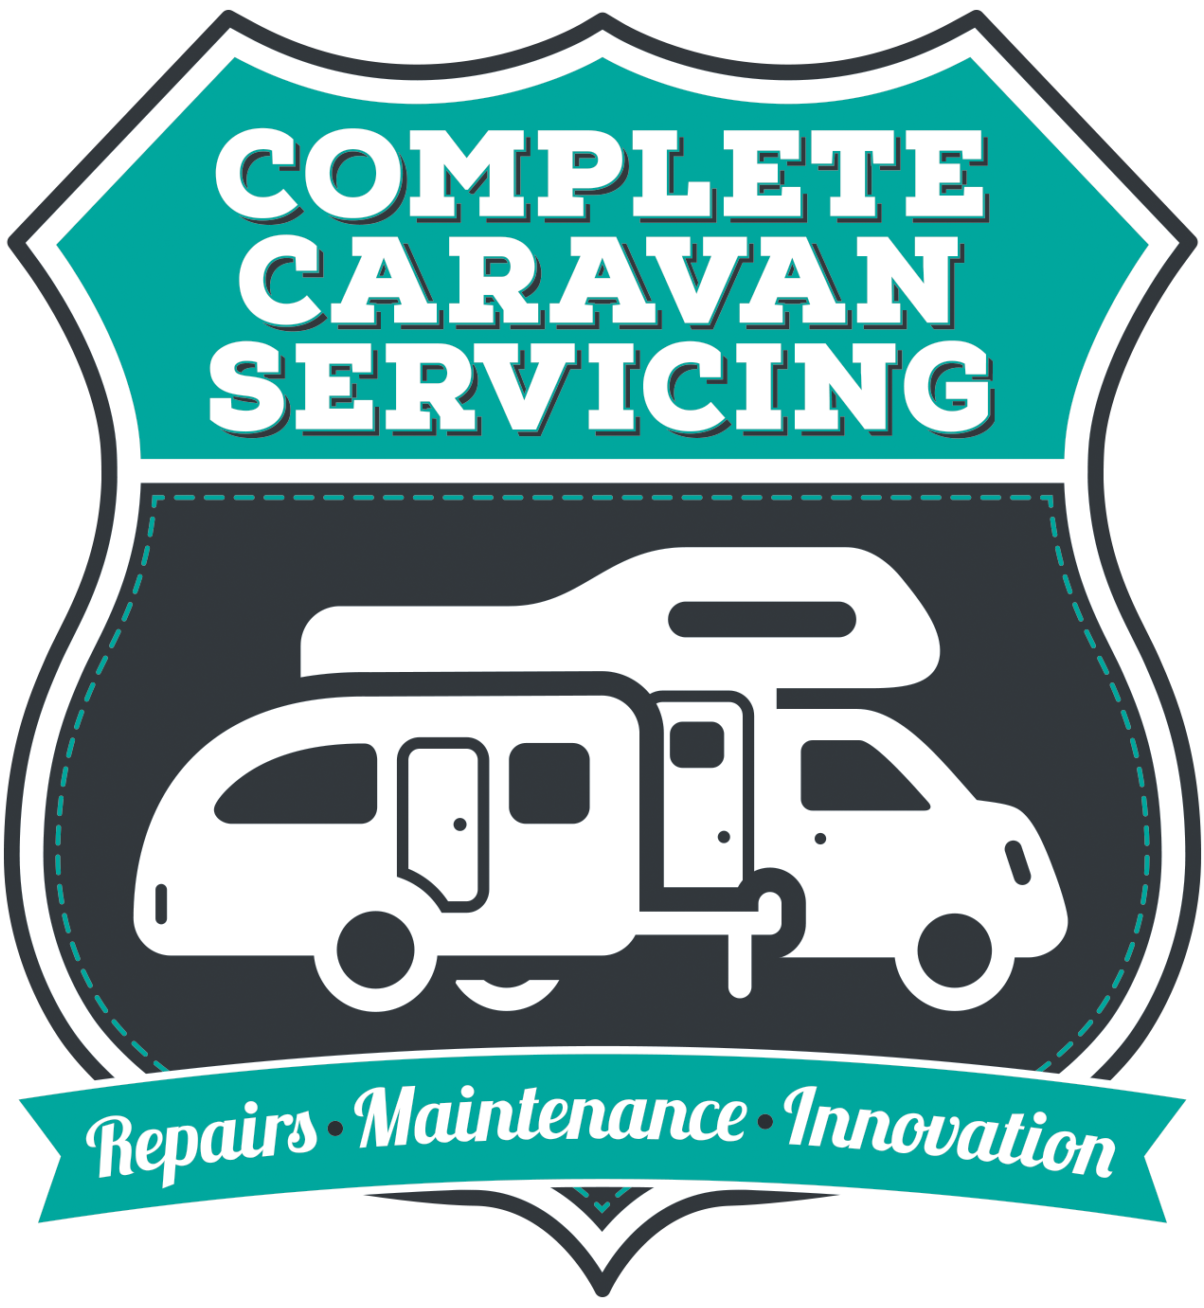 Complete Caravan Servicing